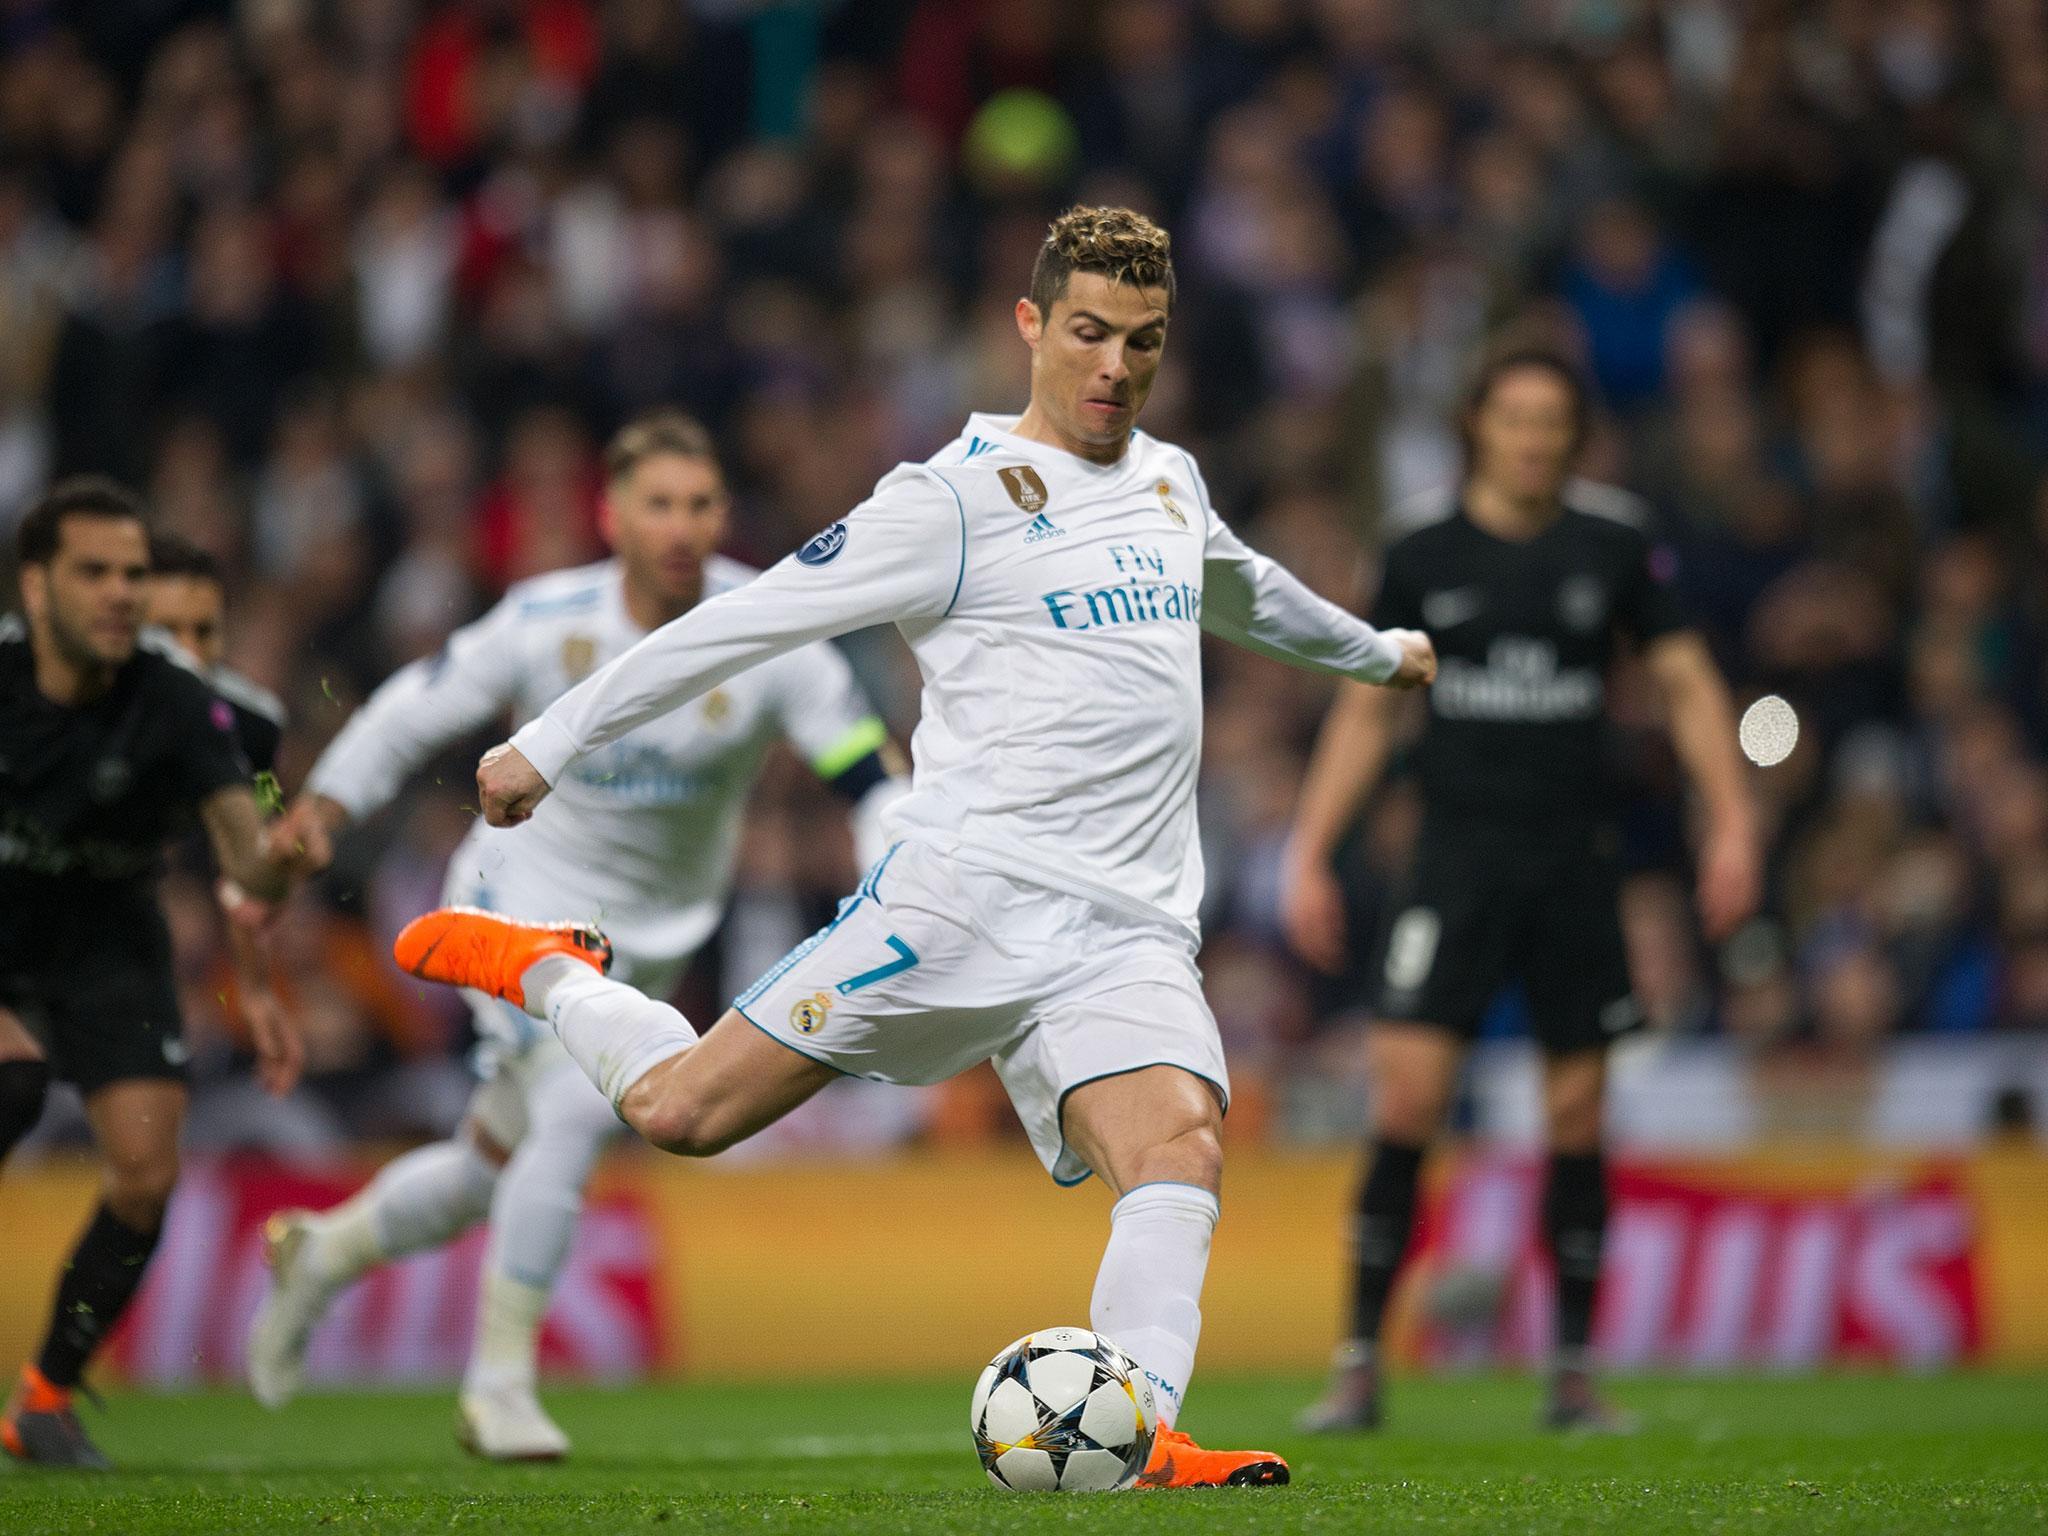 Real Madrid Vs Leganes Online Free